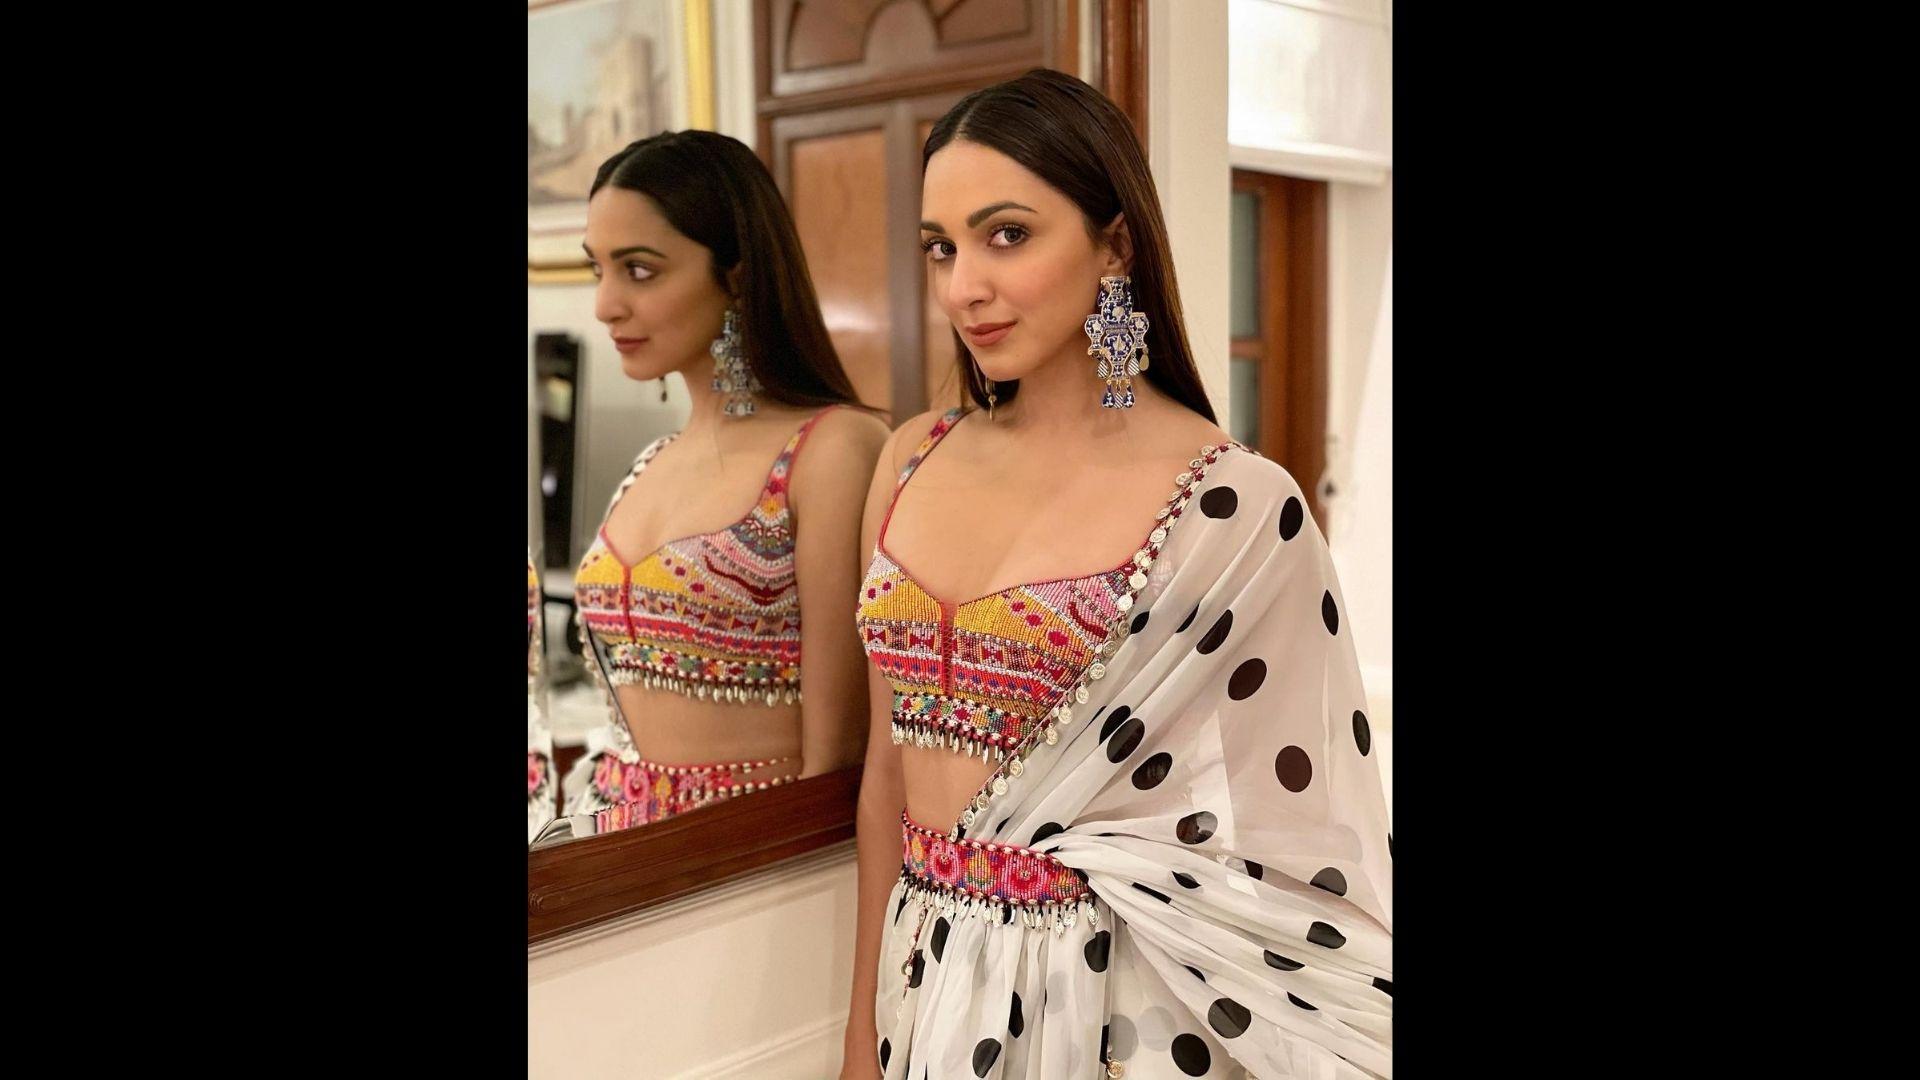 Kiara Advani Propagates Spirituality Over Sexiness In Her Cryptic IG Post